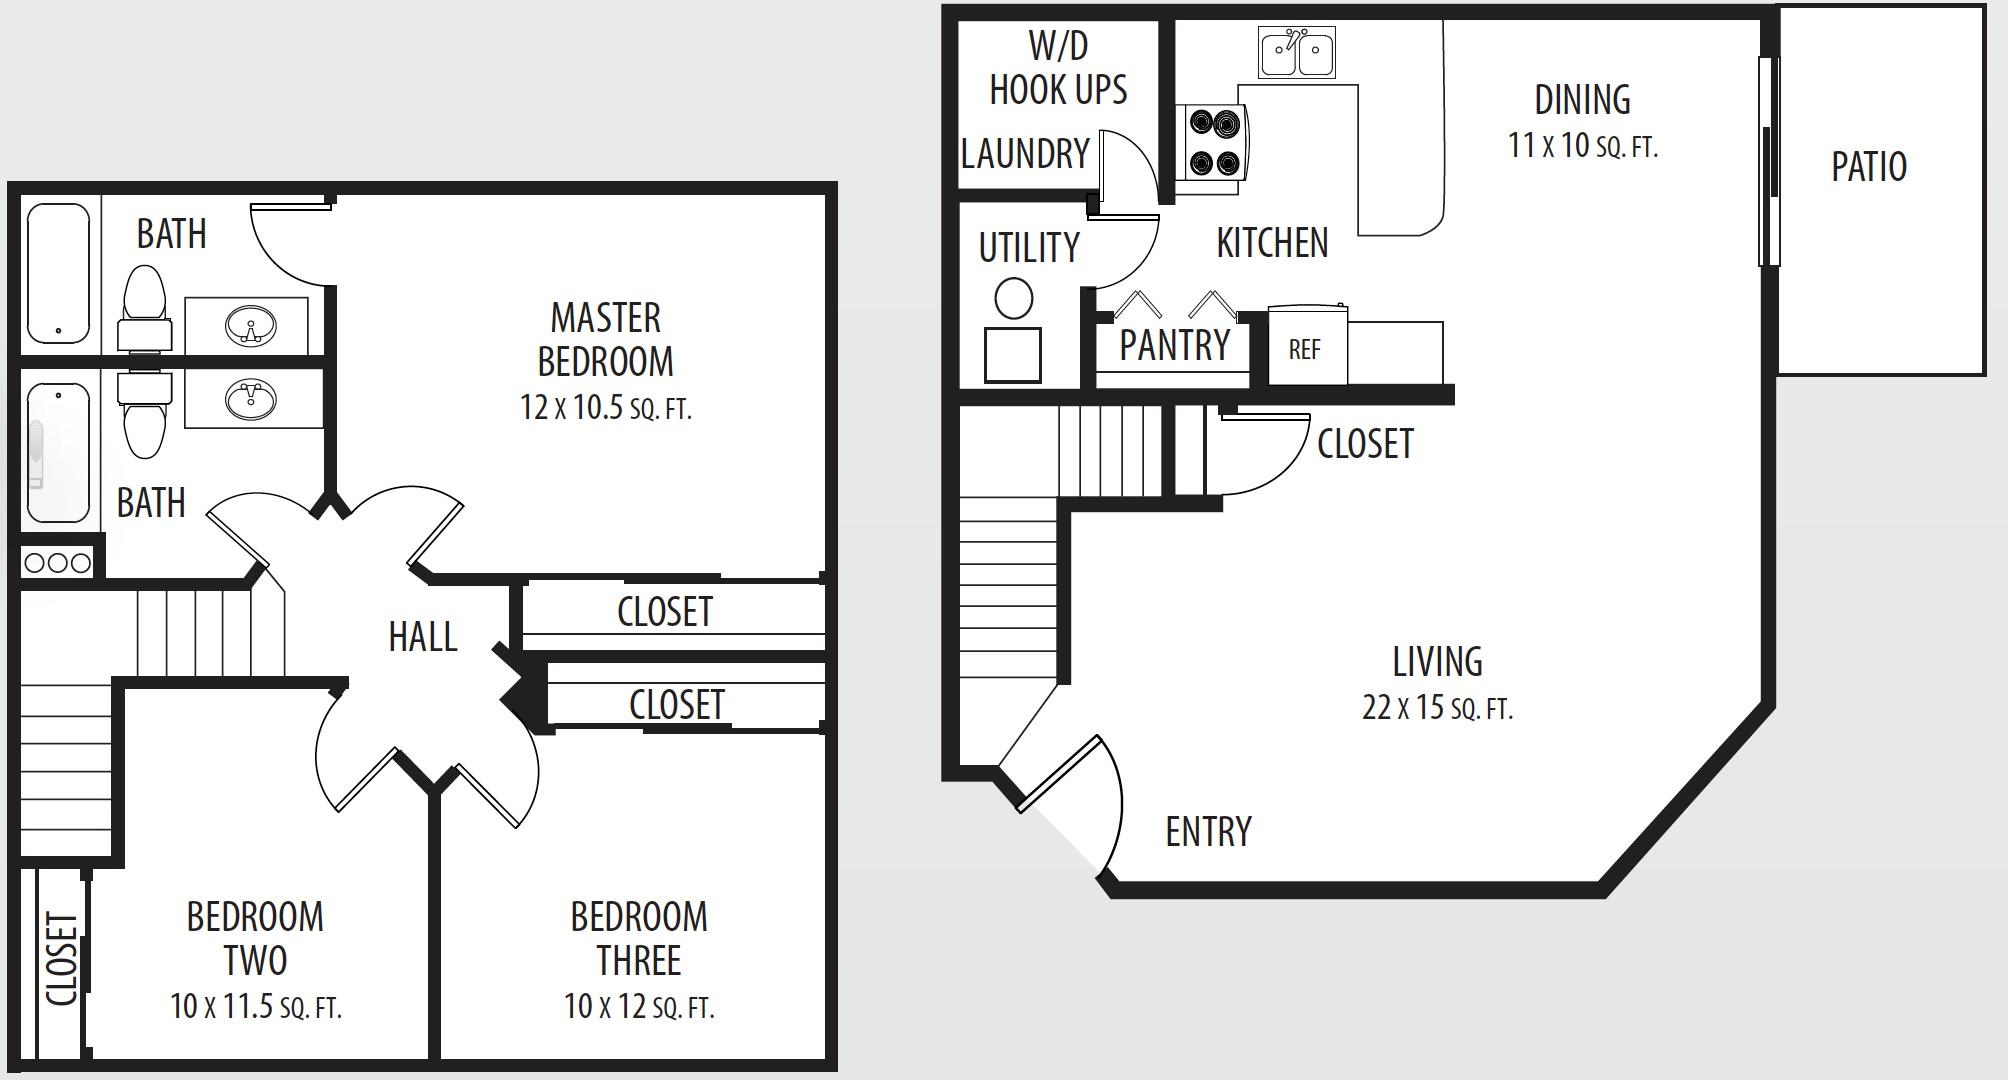 Stonebridge apartments west jordan utah floor plan for Utah floor plans